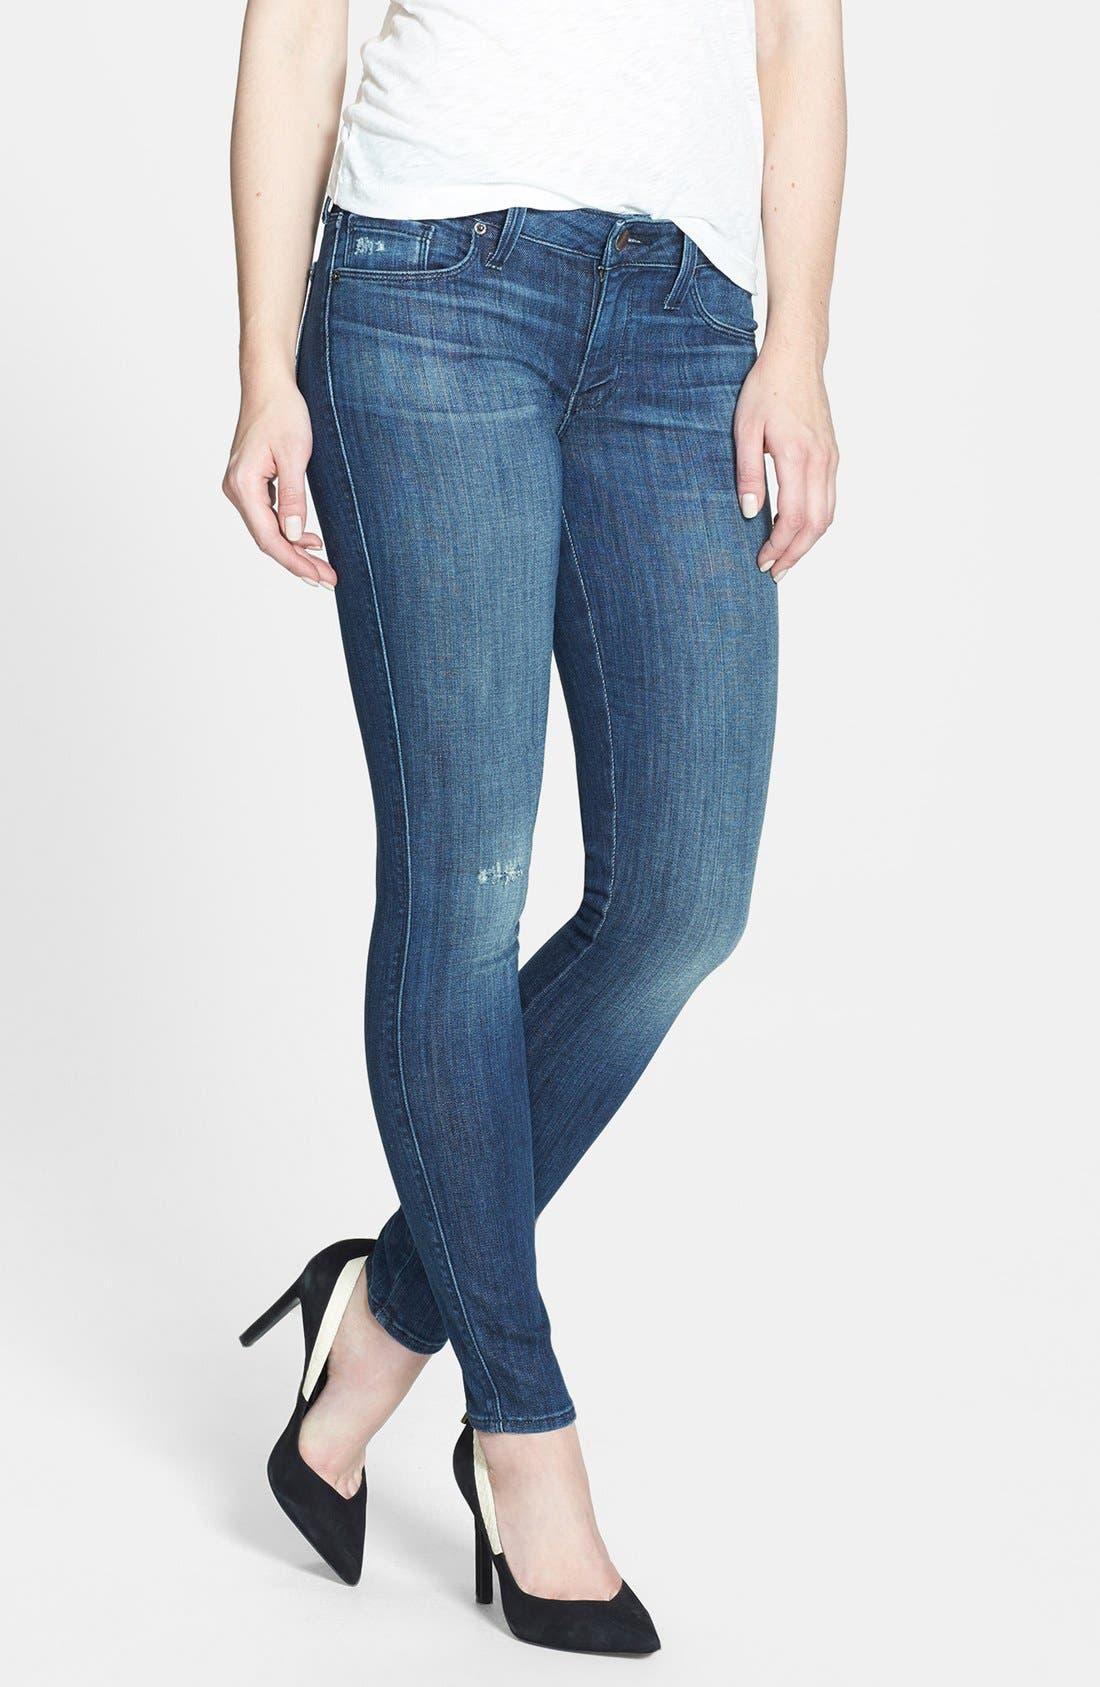 Alternate Image 1 Selected - Genetic 'Shya' Cigarette Skinny Jeans (Enigma)